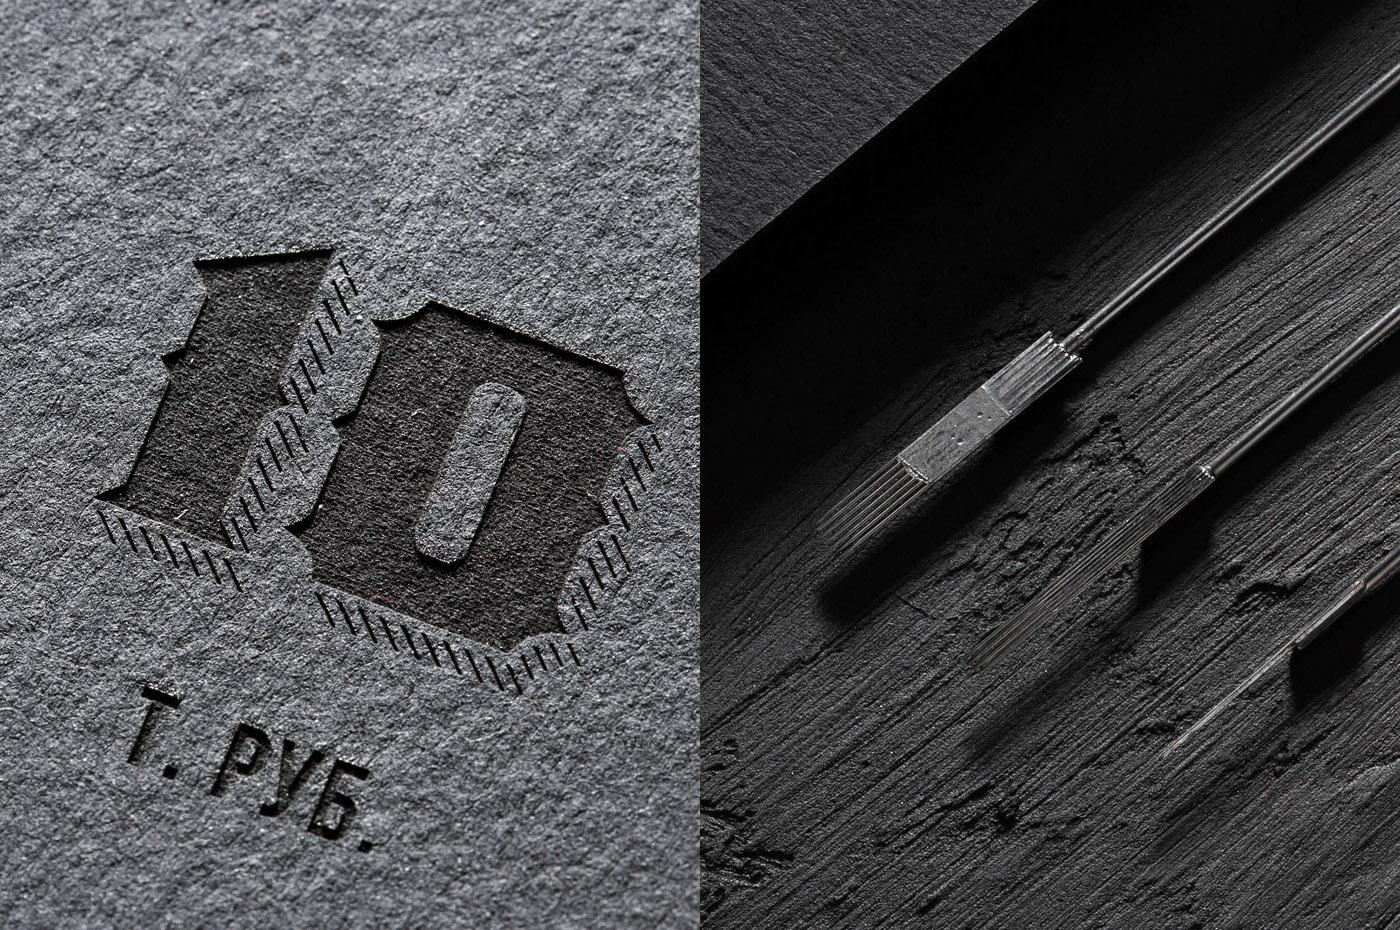 tattoo ink black drop bottle tattoo machine Needle engraving skateboard certificate Wax Seal